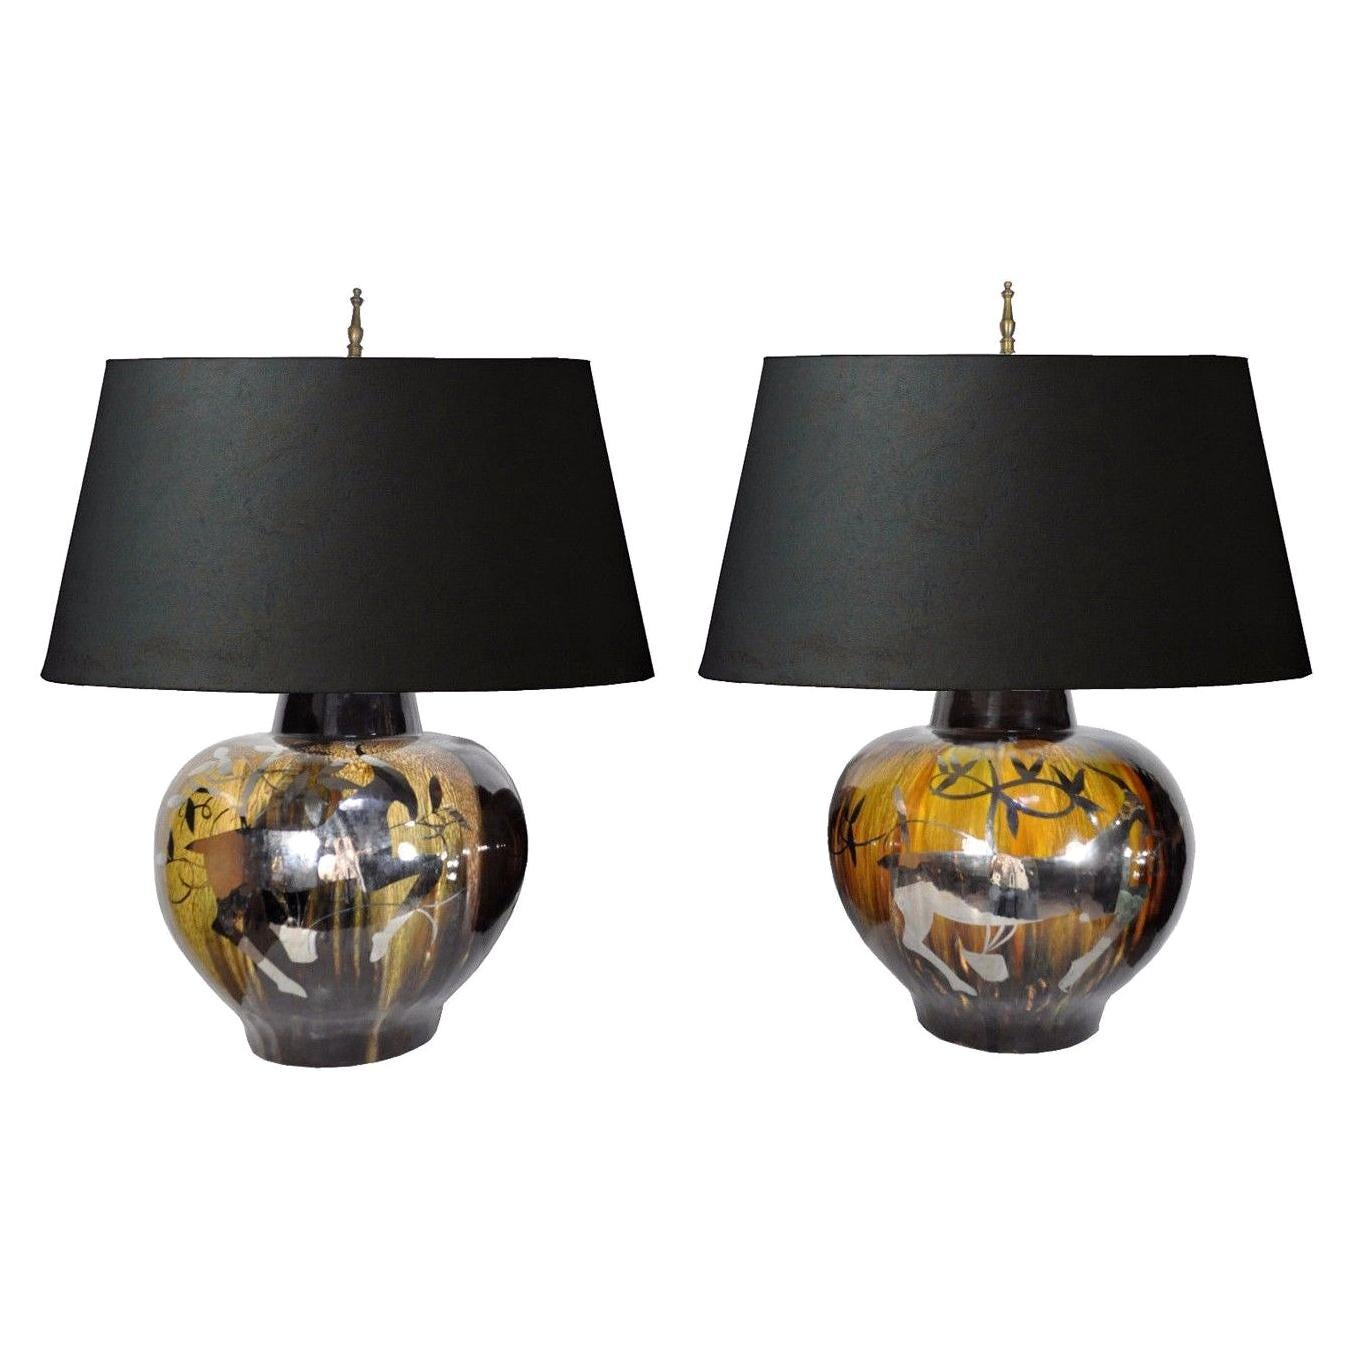 Large Pair of Mid-Century Modern Gazelle Ram Drip Glaze Pottery Table Lamps